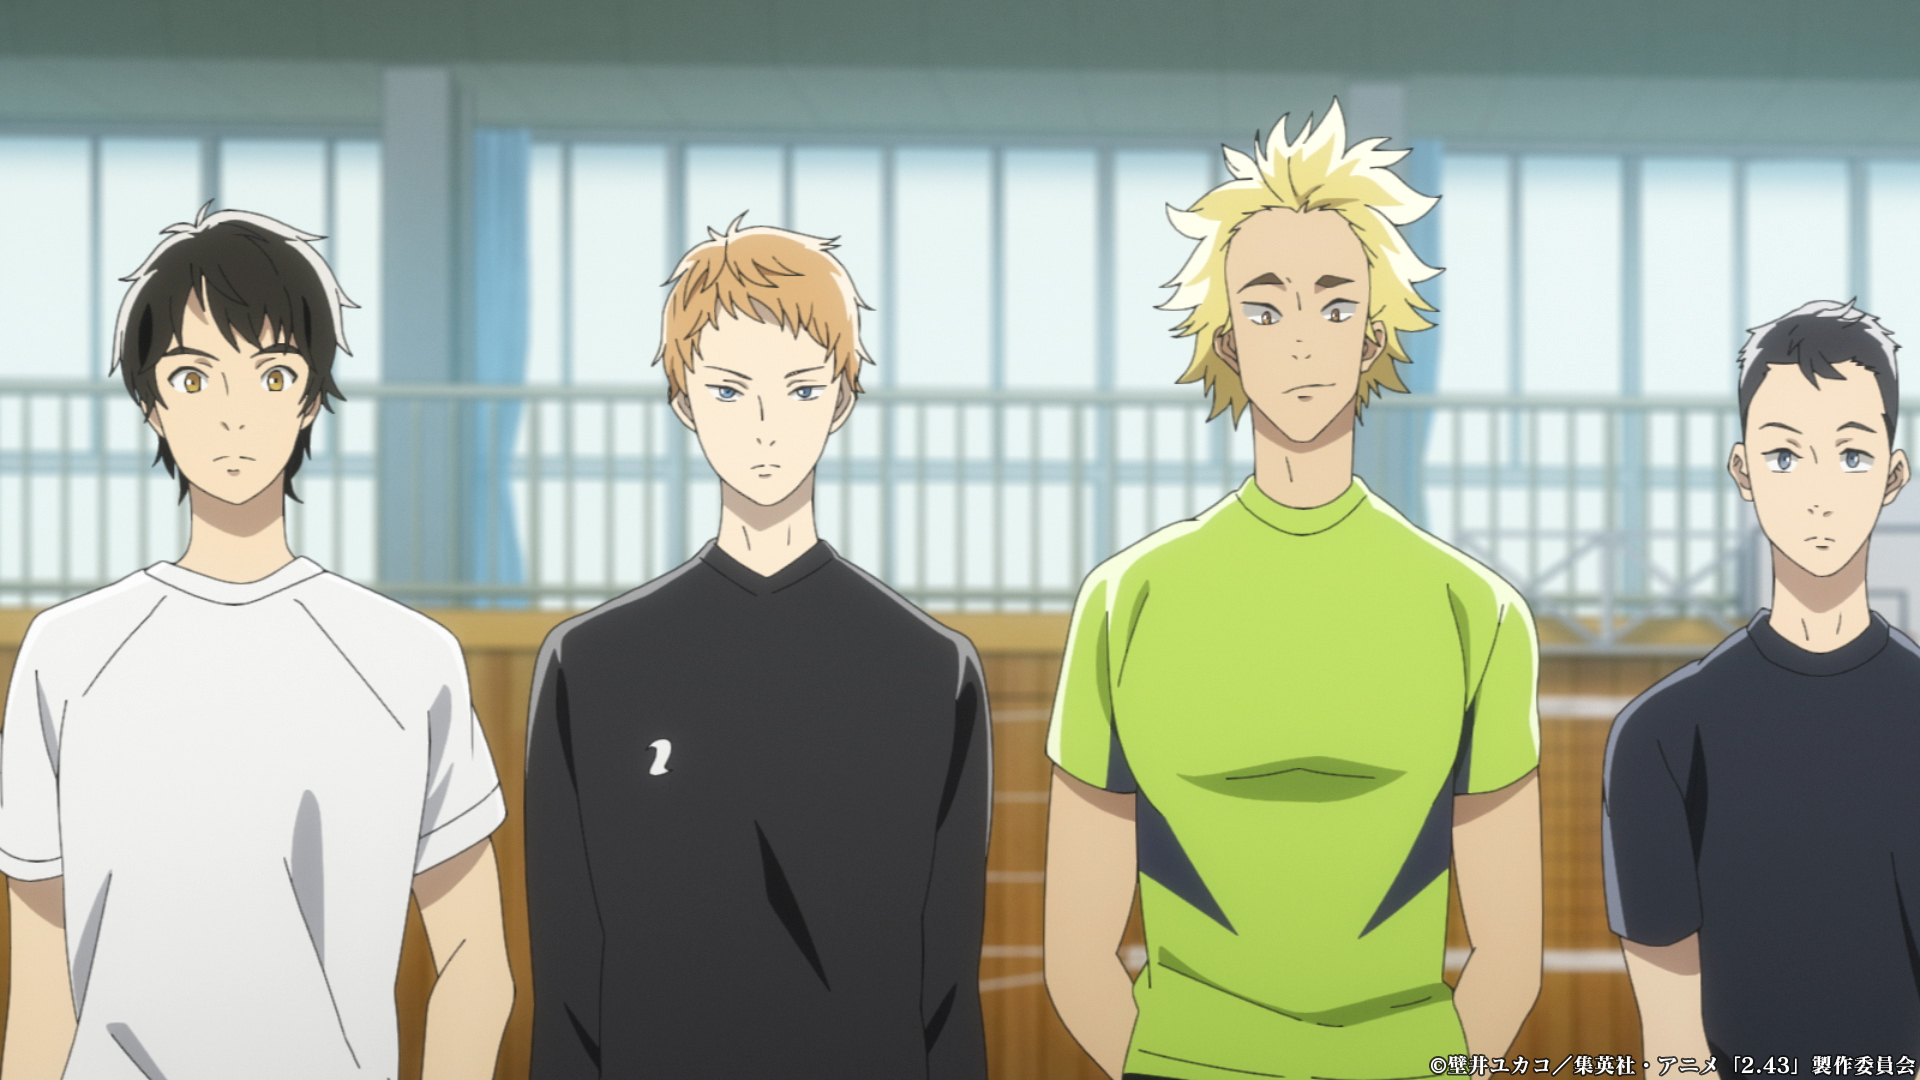 TVアニメ「2.43清陰高校男子バレー部」第4話「高く、はやく、強く」感想